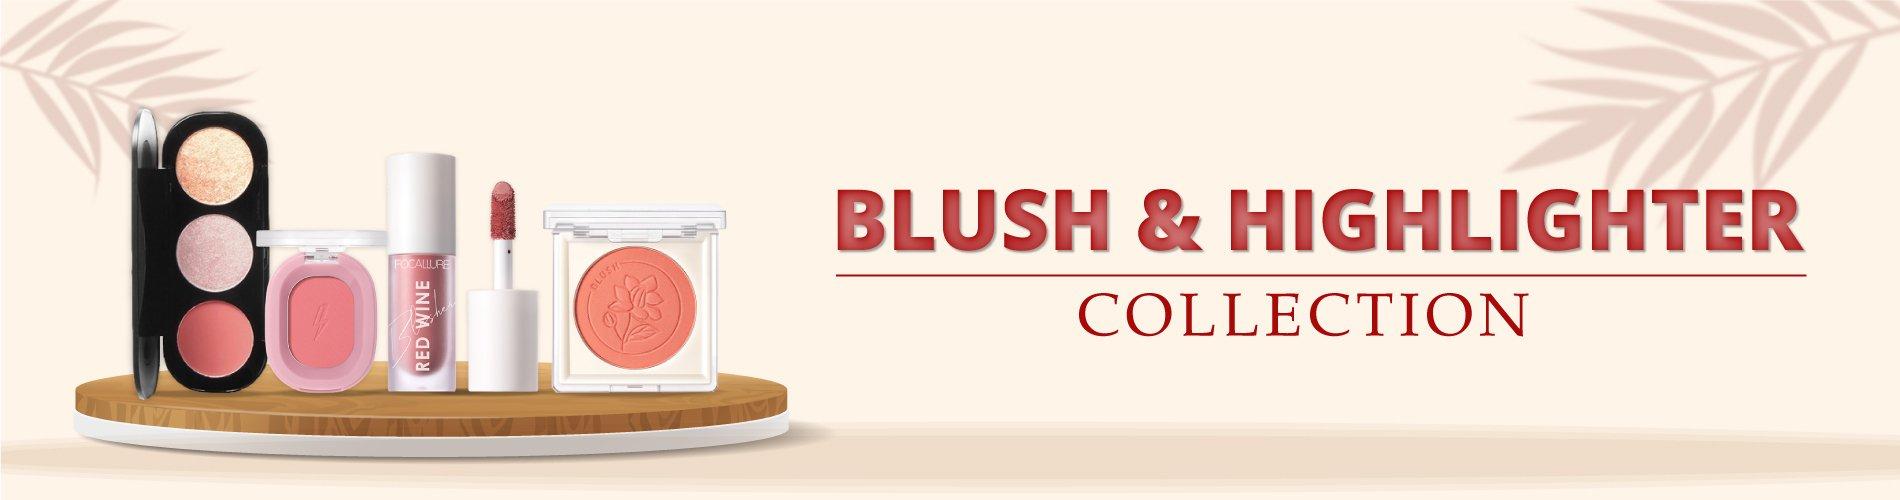 Blush and Highlighter Banner